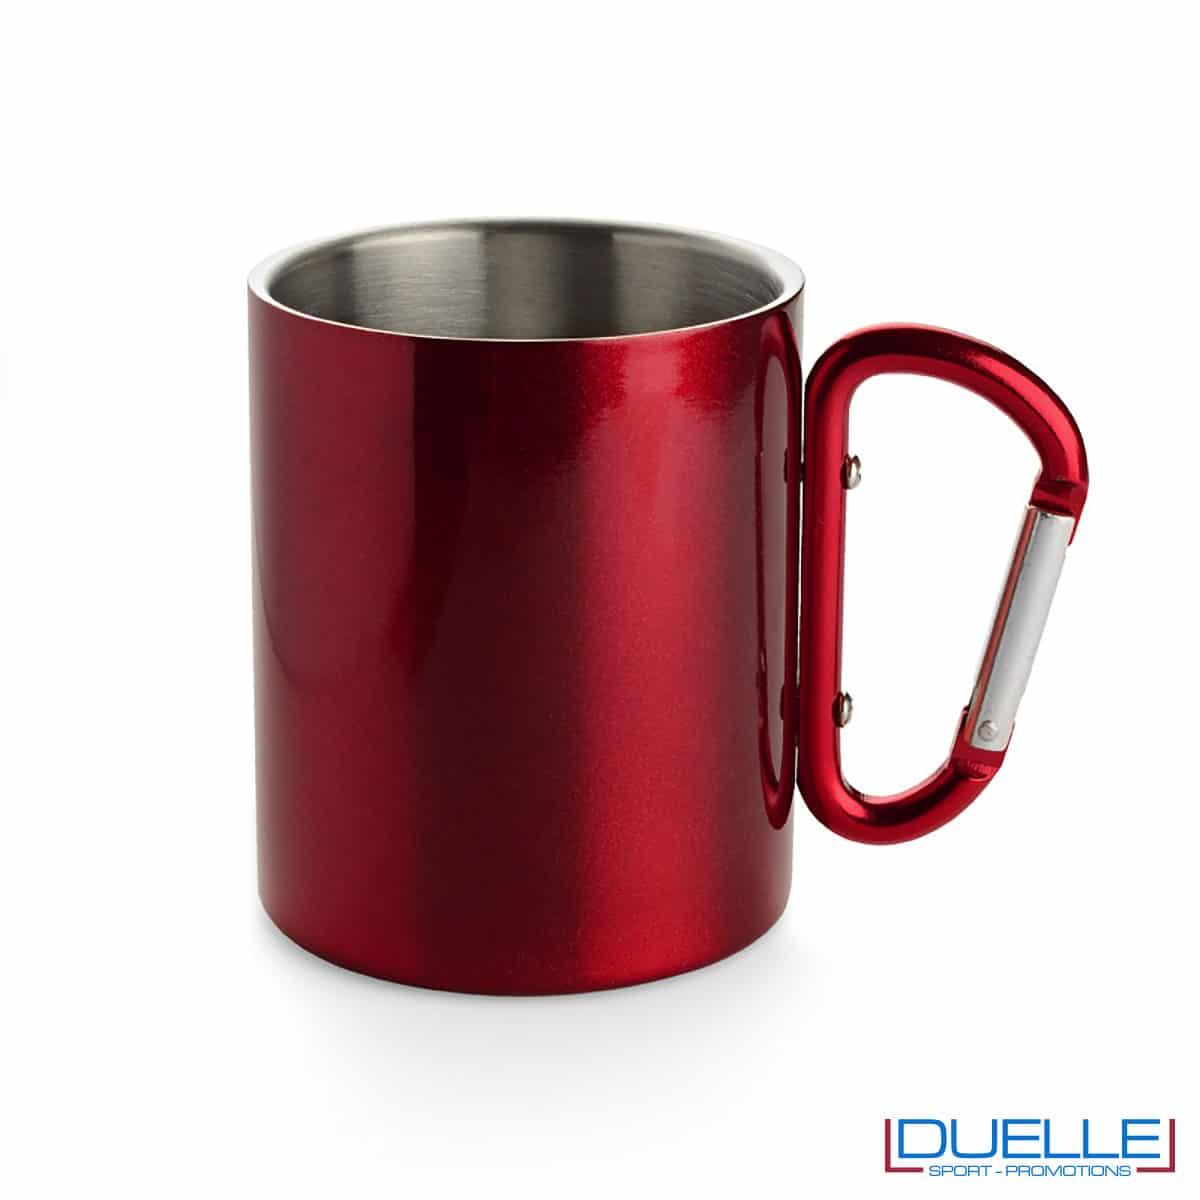 tazza per backpack rossa